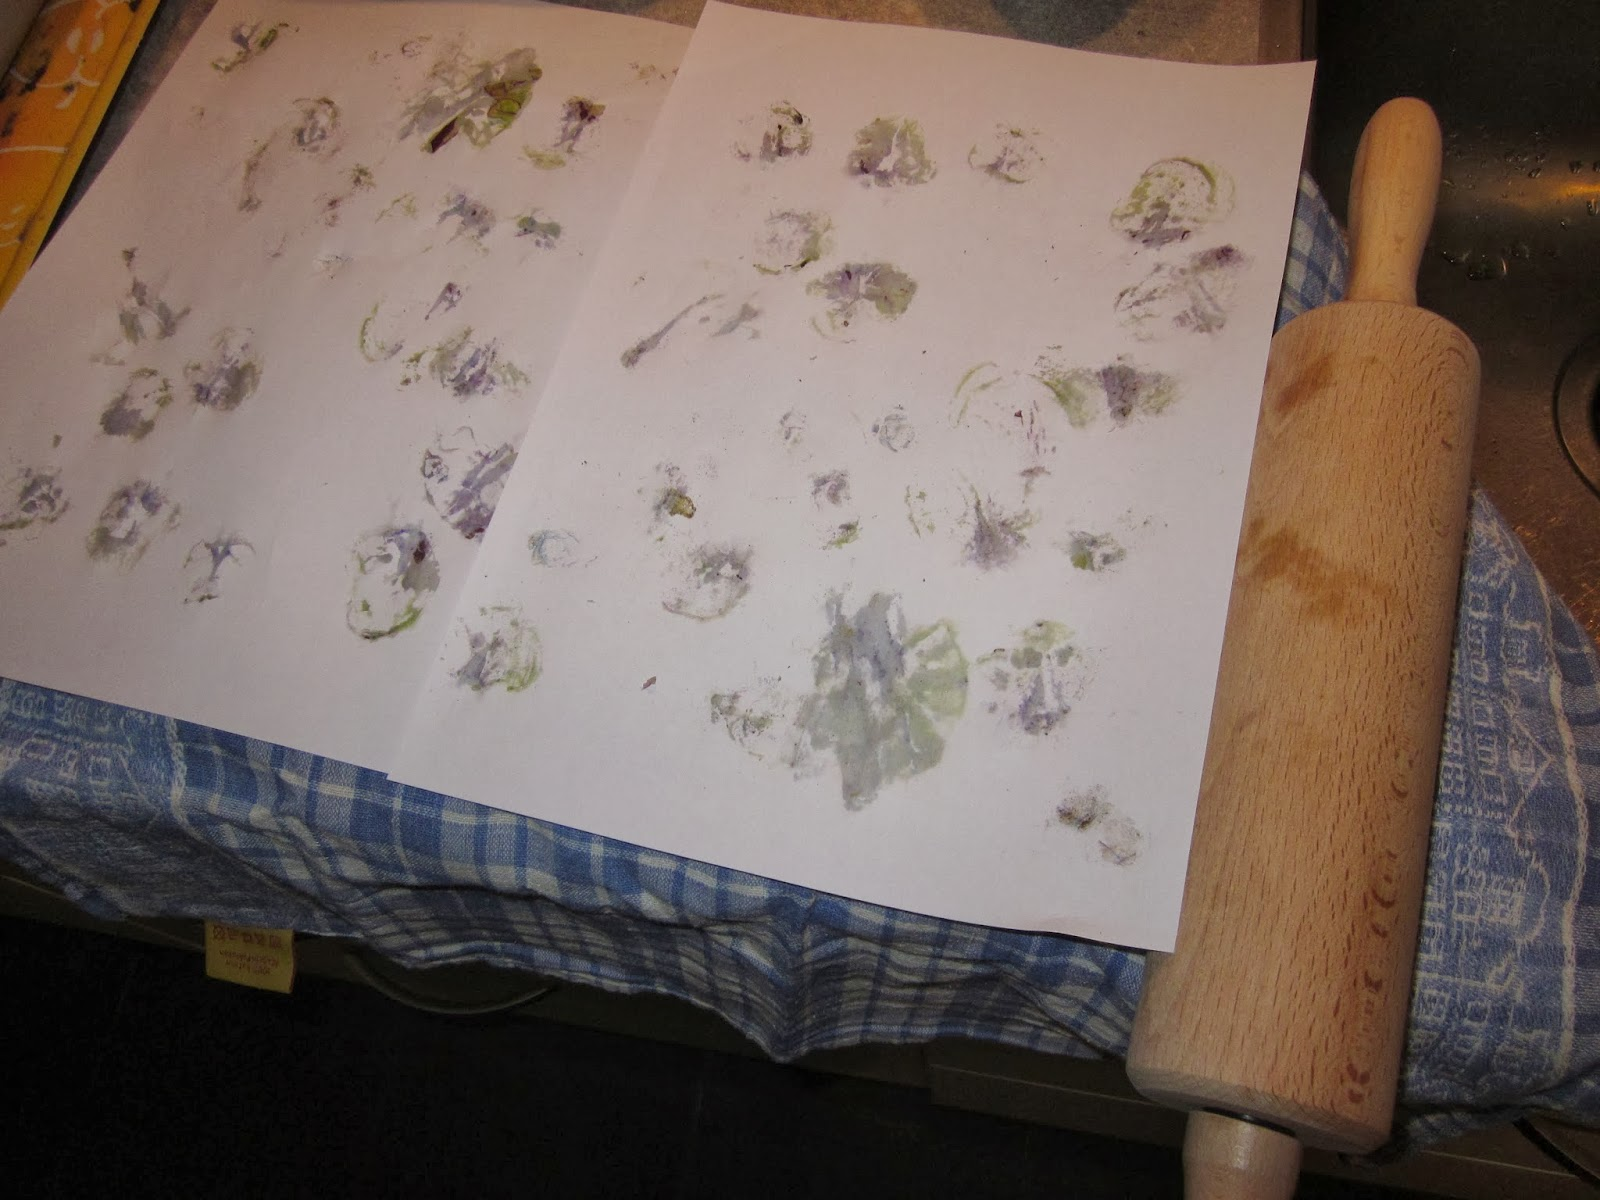 Huis tuin en keuken: m: paarse spruitjes, van begin tot eind